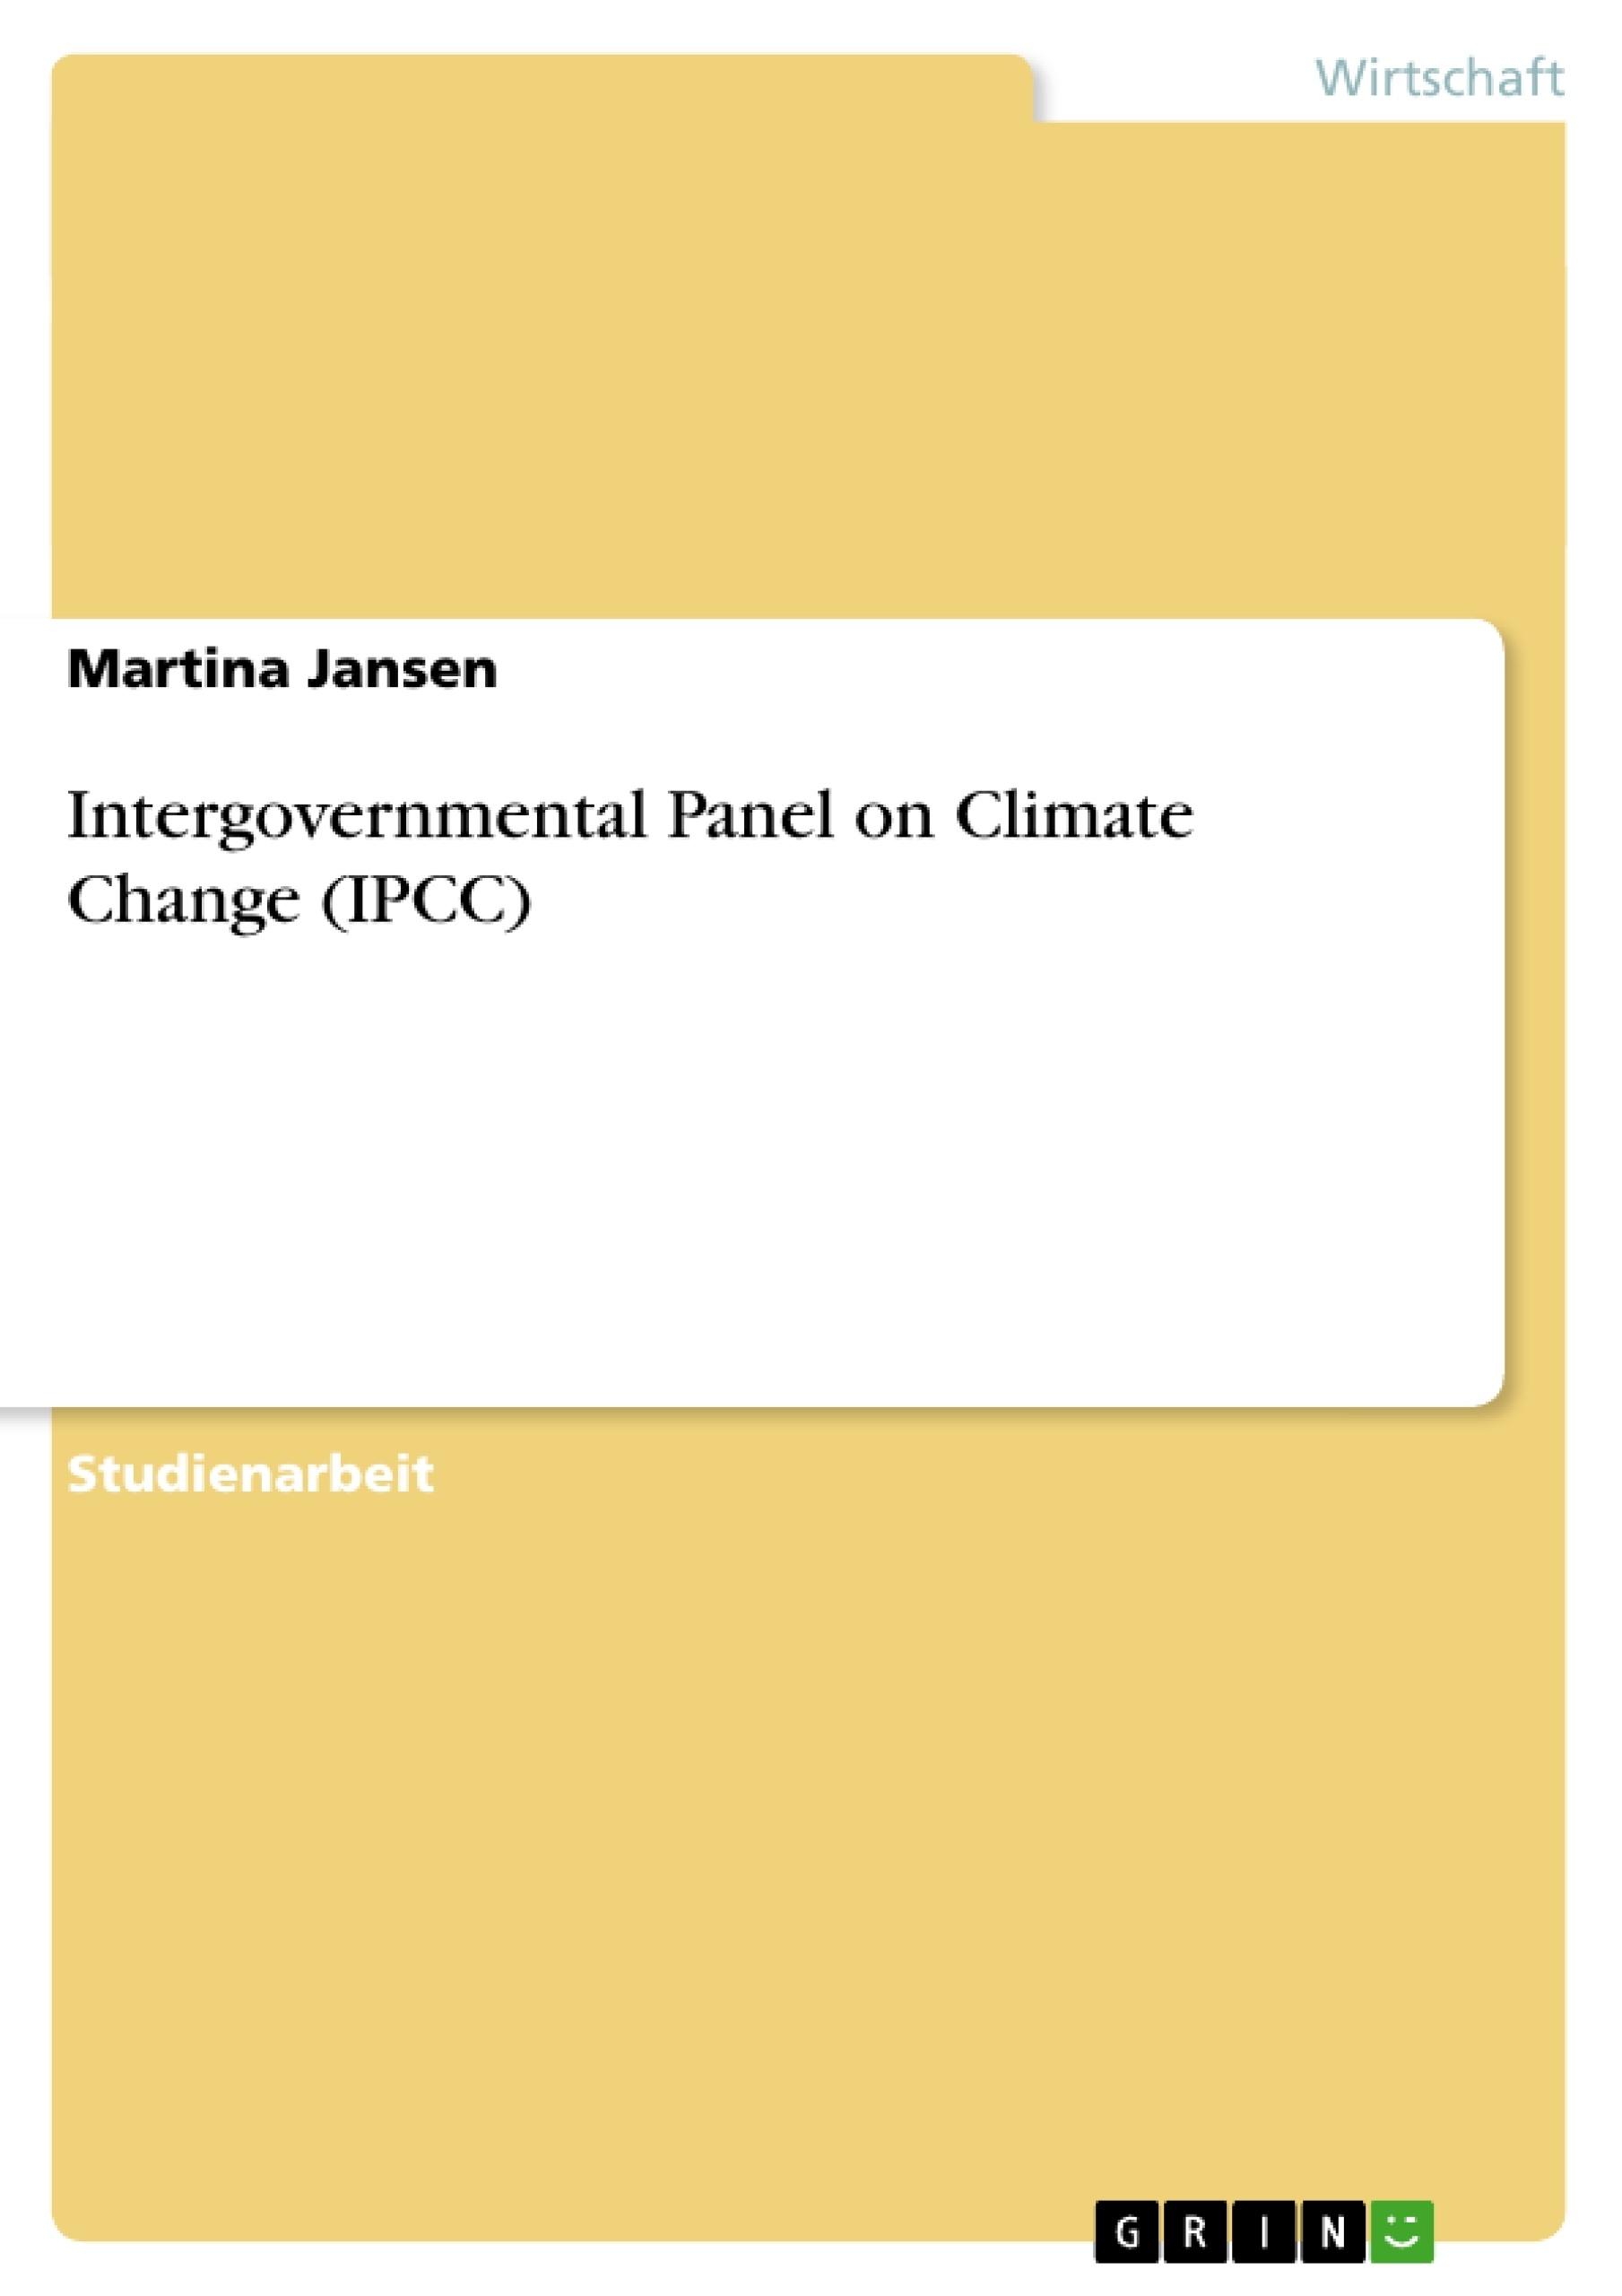 Titel: Intergovernmental Panel on Climate Change (IPCC)